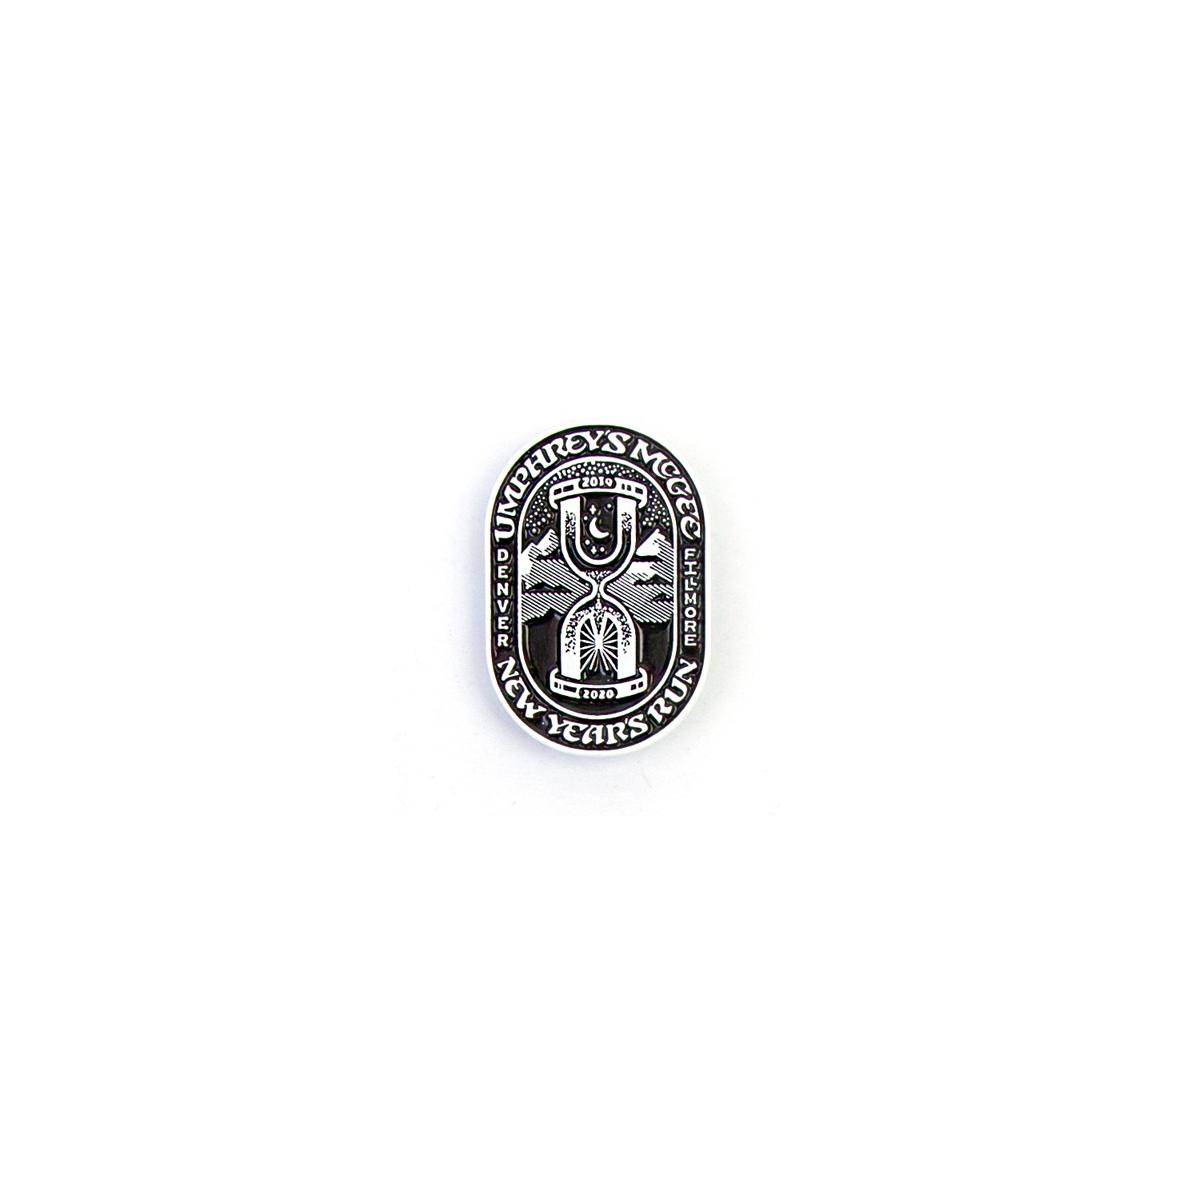 NYE 2019 Hourglass Pin